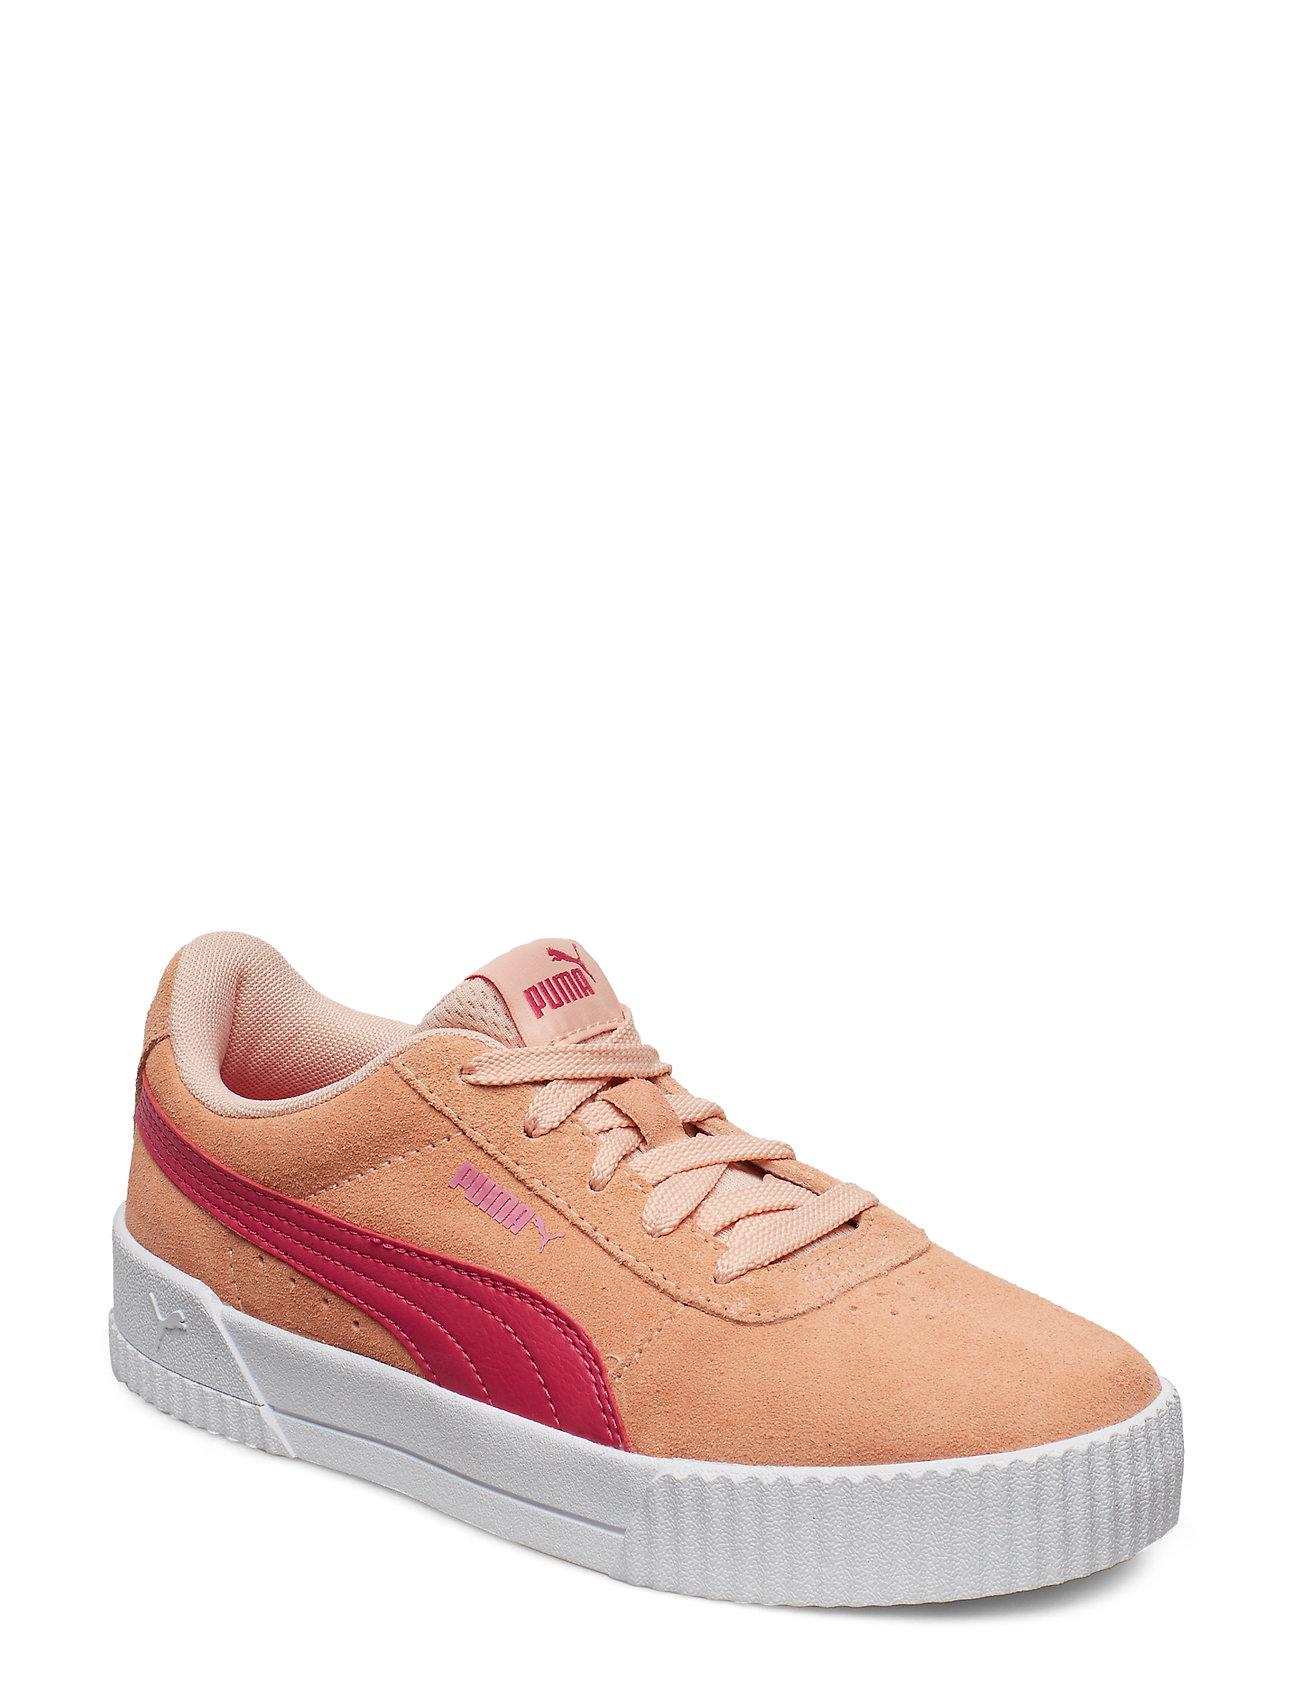 Carina Ps Sneakers Sko Orange PUMA